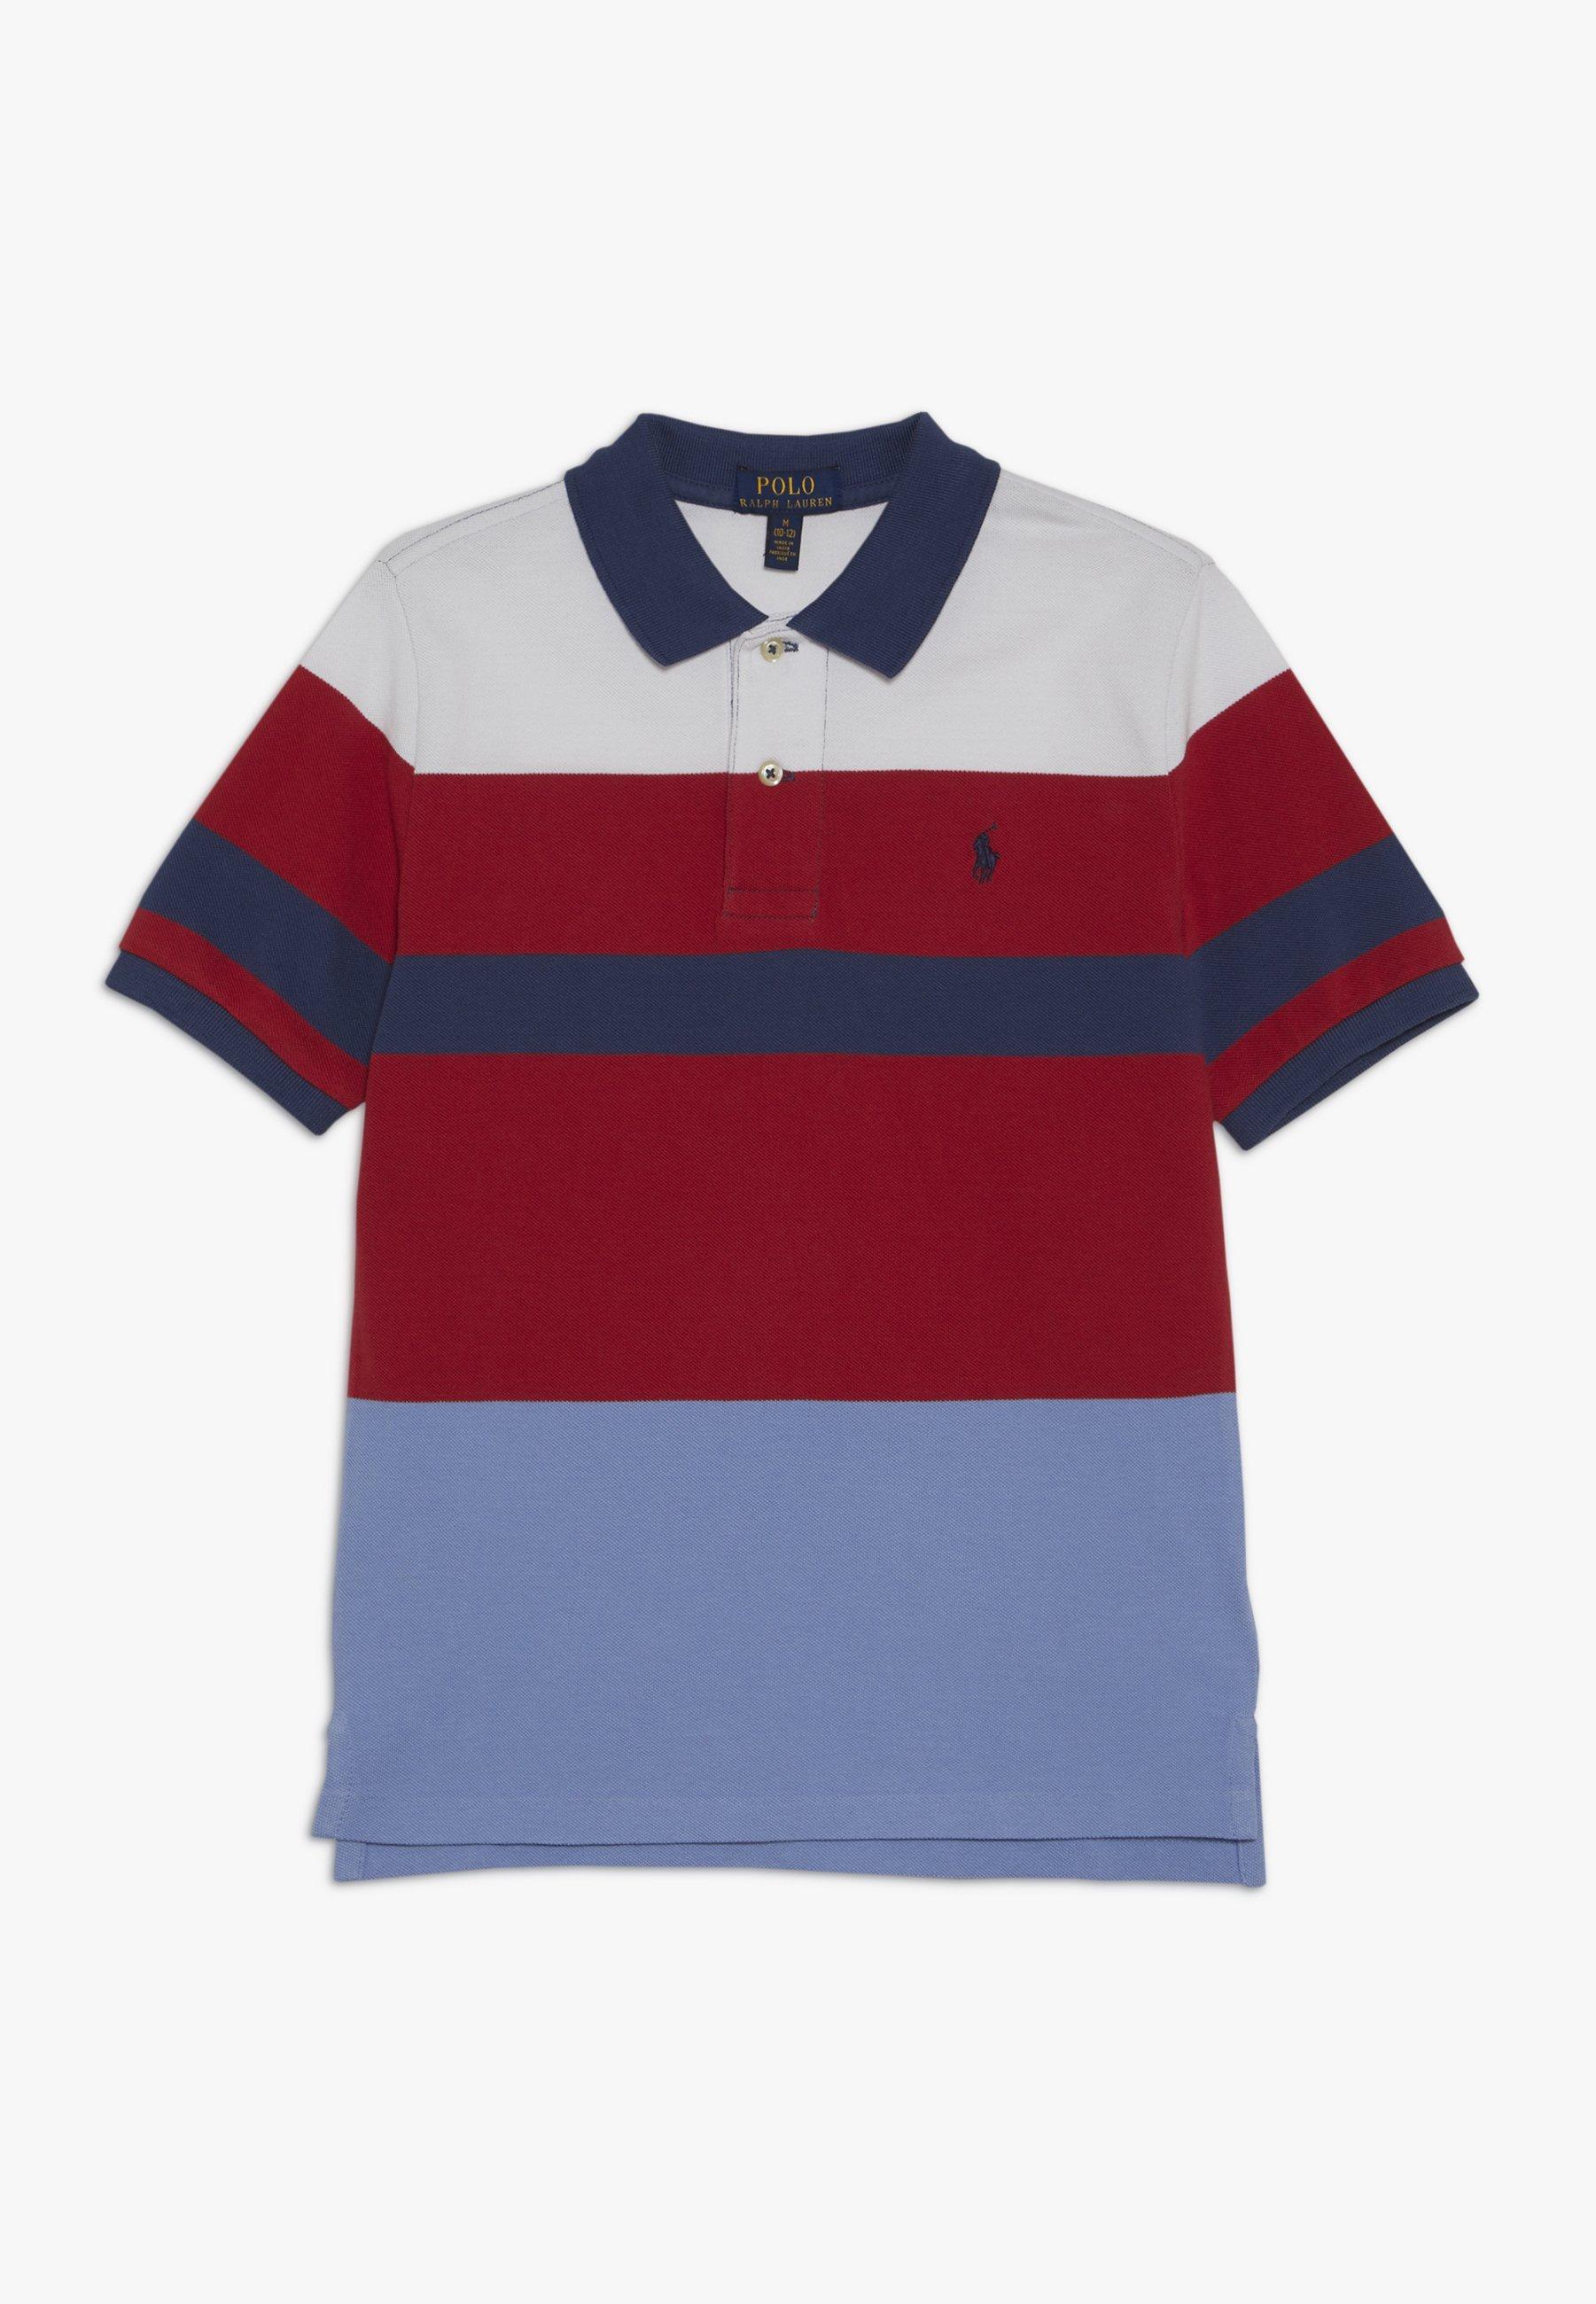 2013 Wholesale Polo Ralph Lauren Polo shirt - sunrise red | kids's clothing 2020 fZW5S